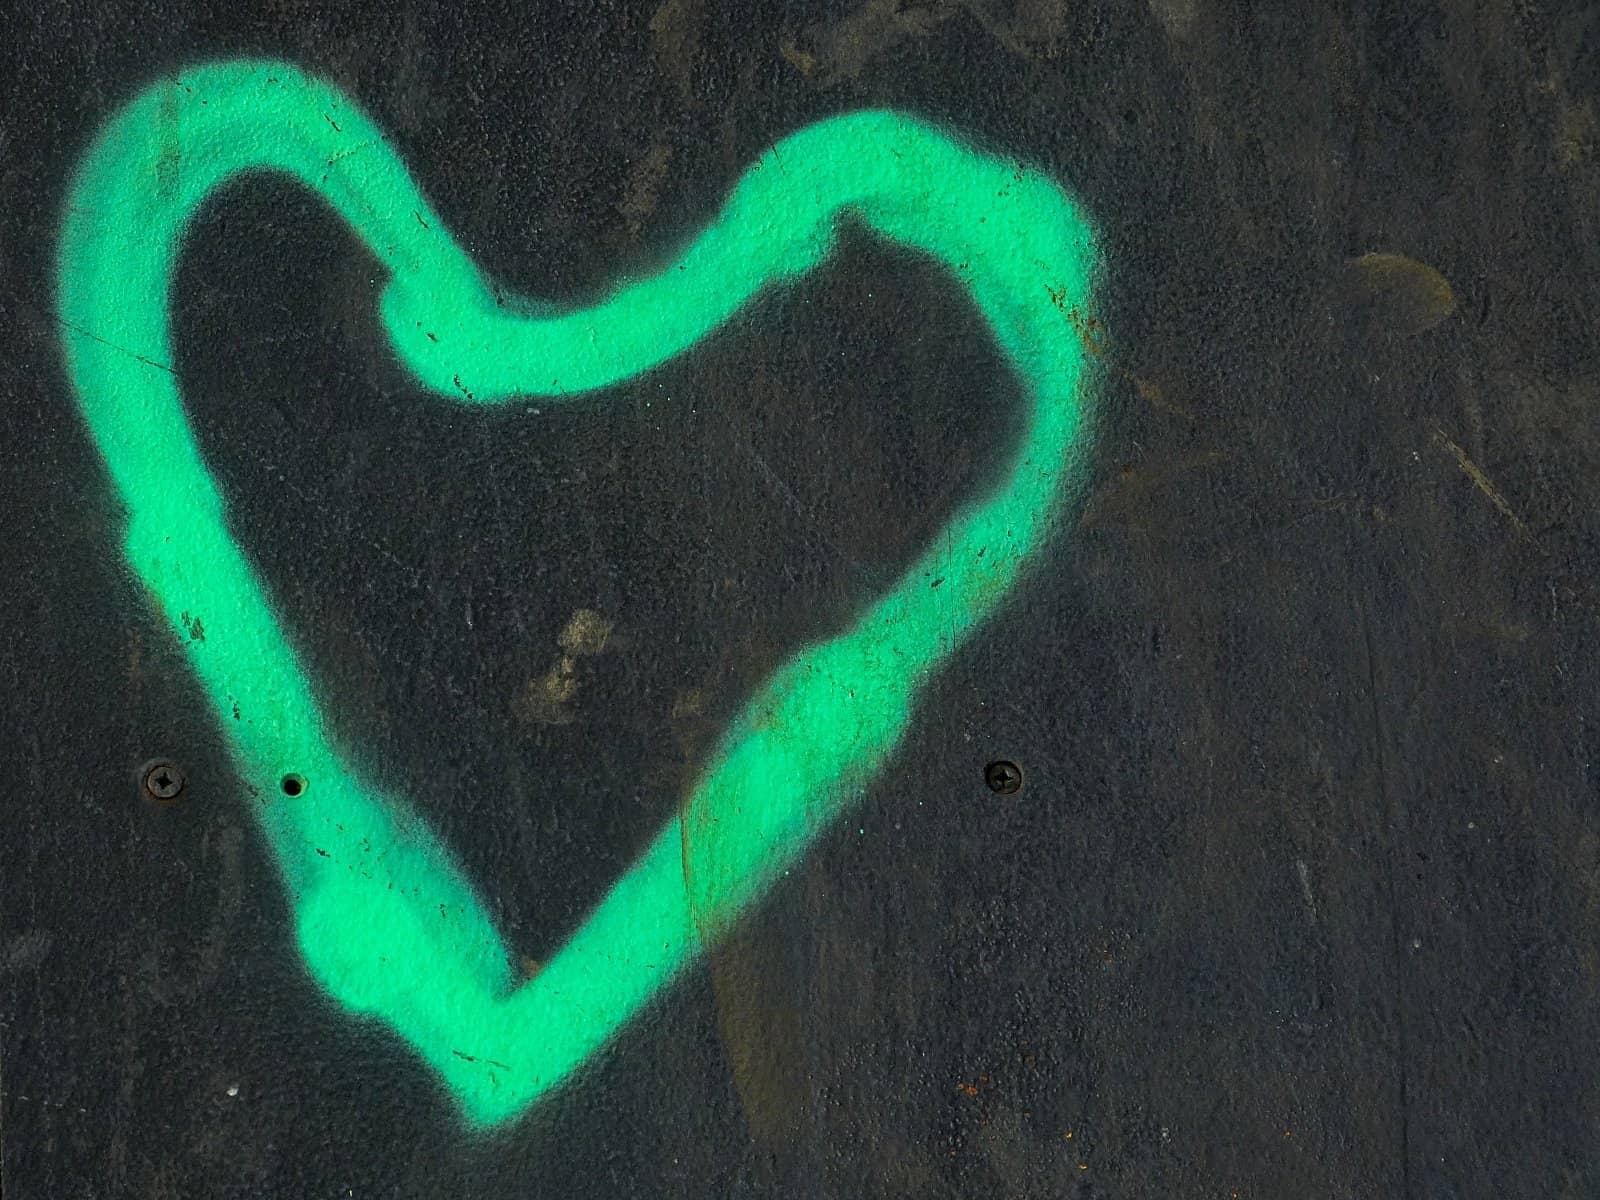 A graffiti heart in bright green